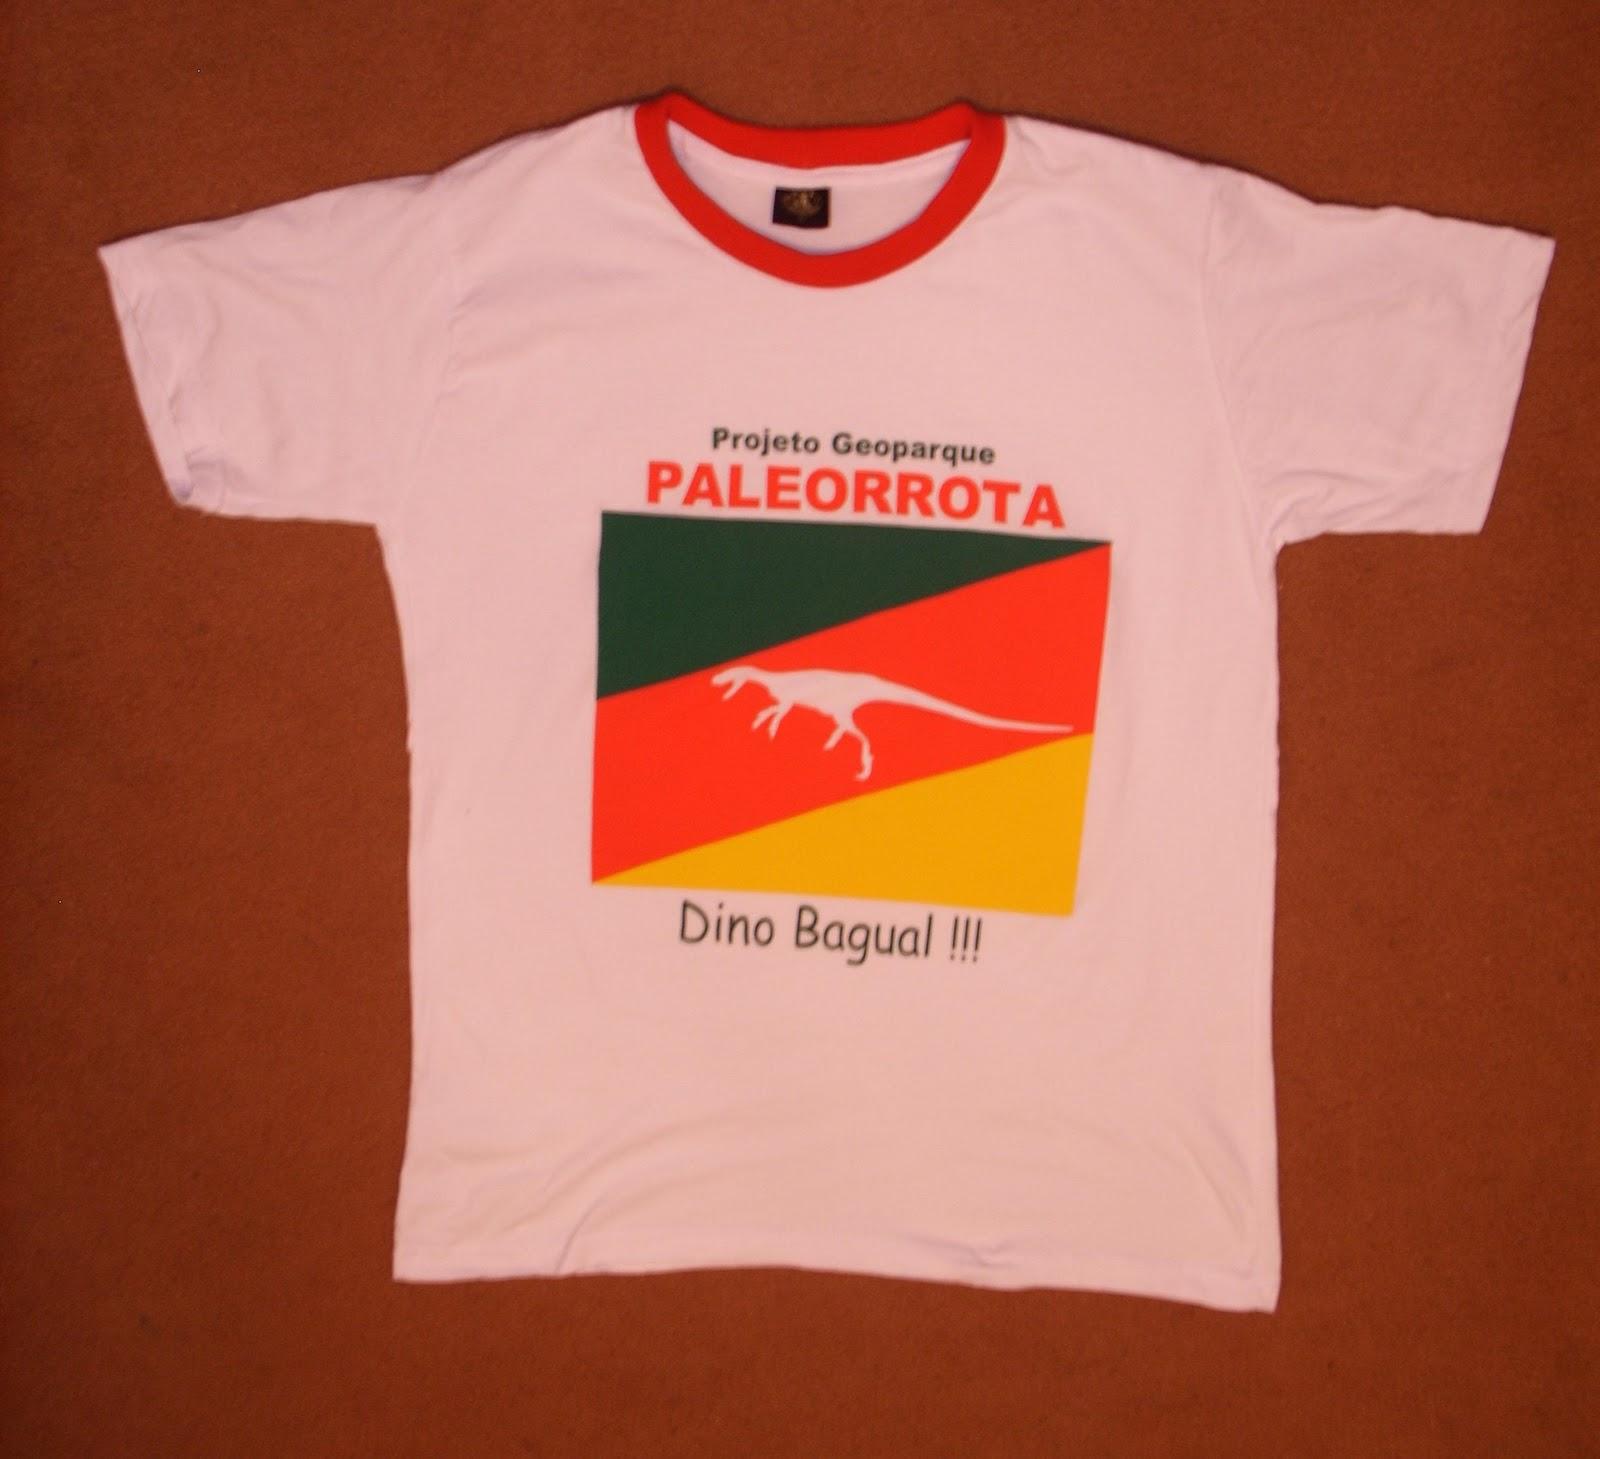 Camiseta da Paleorrota